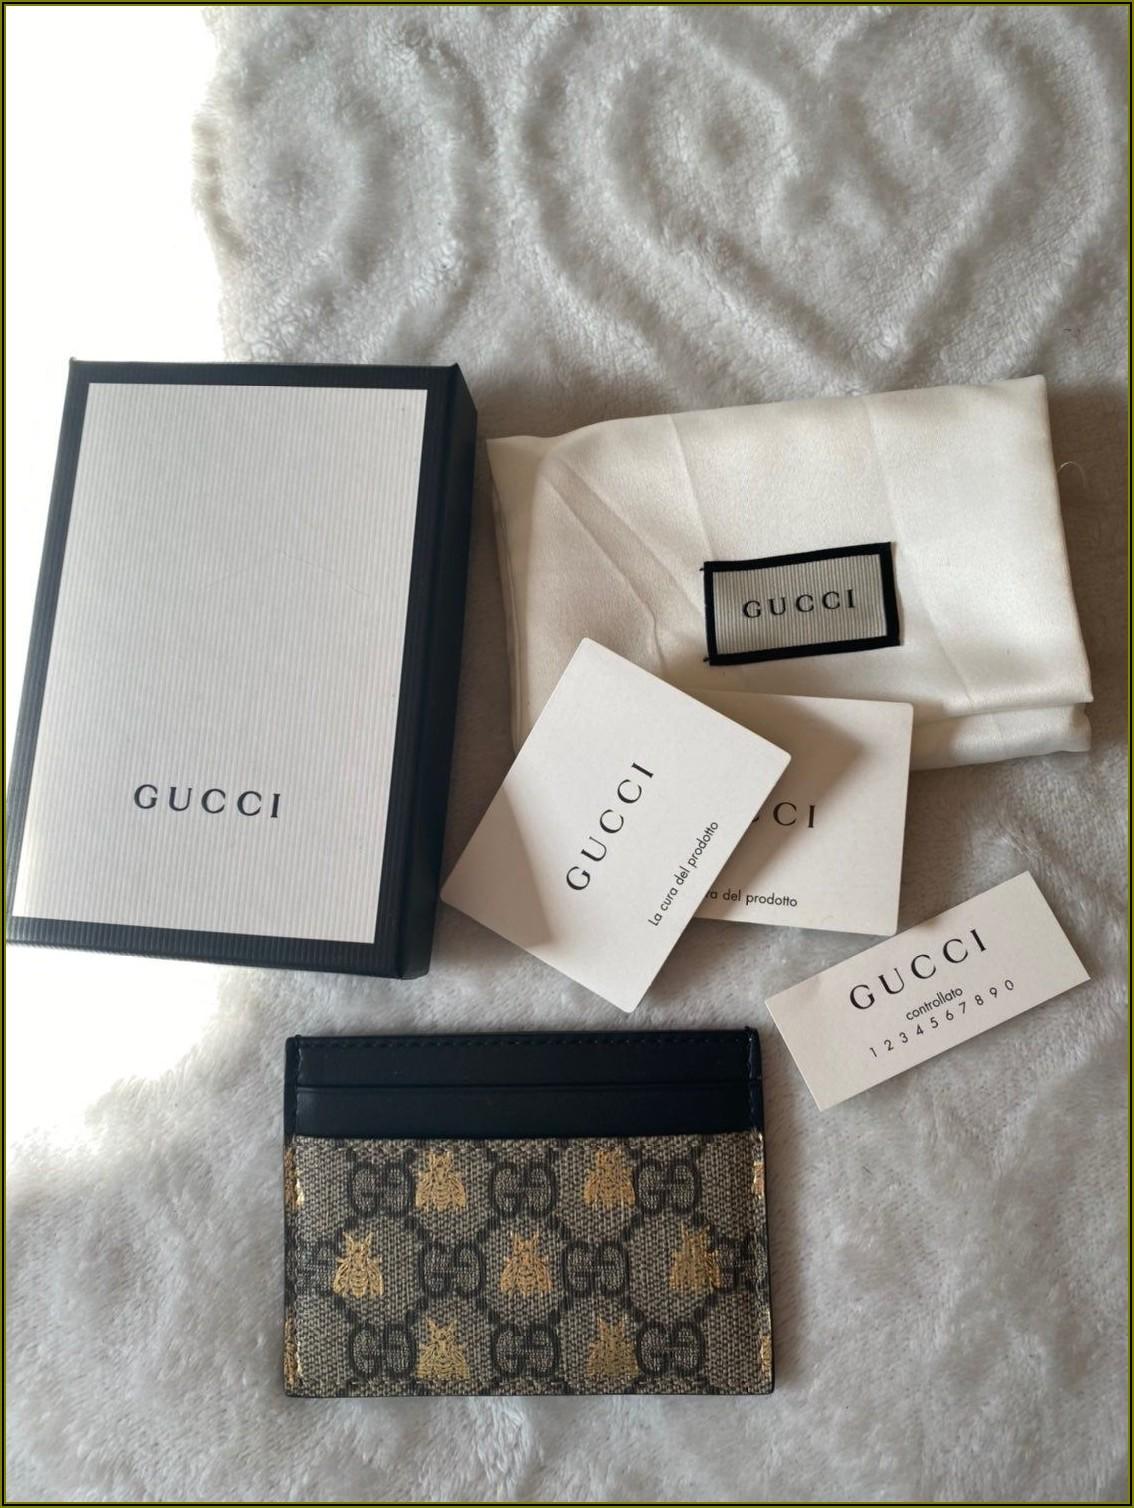 Gucci Women's Business Card Holder